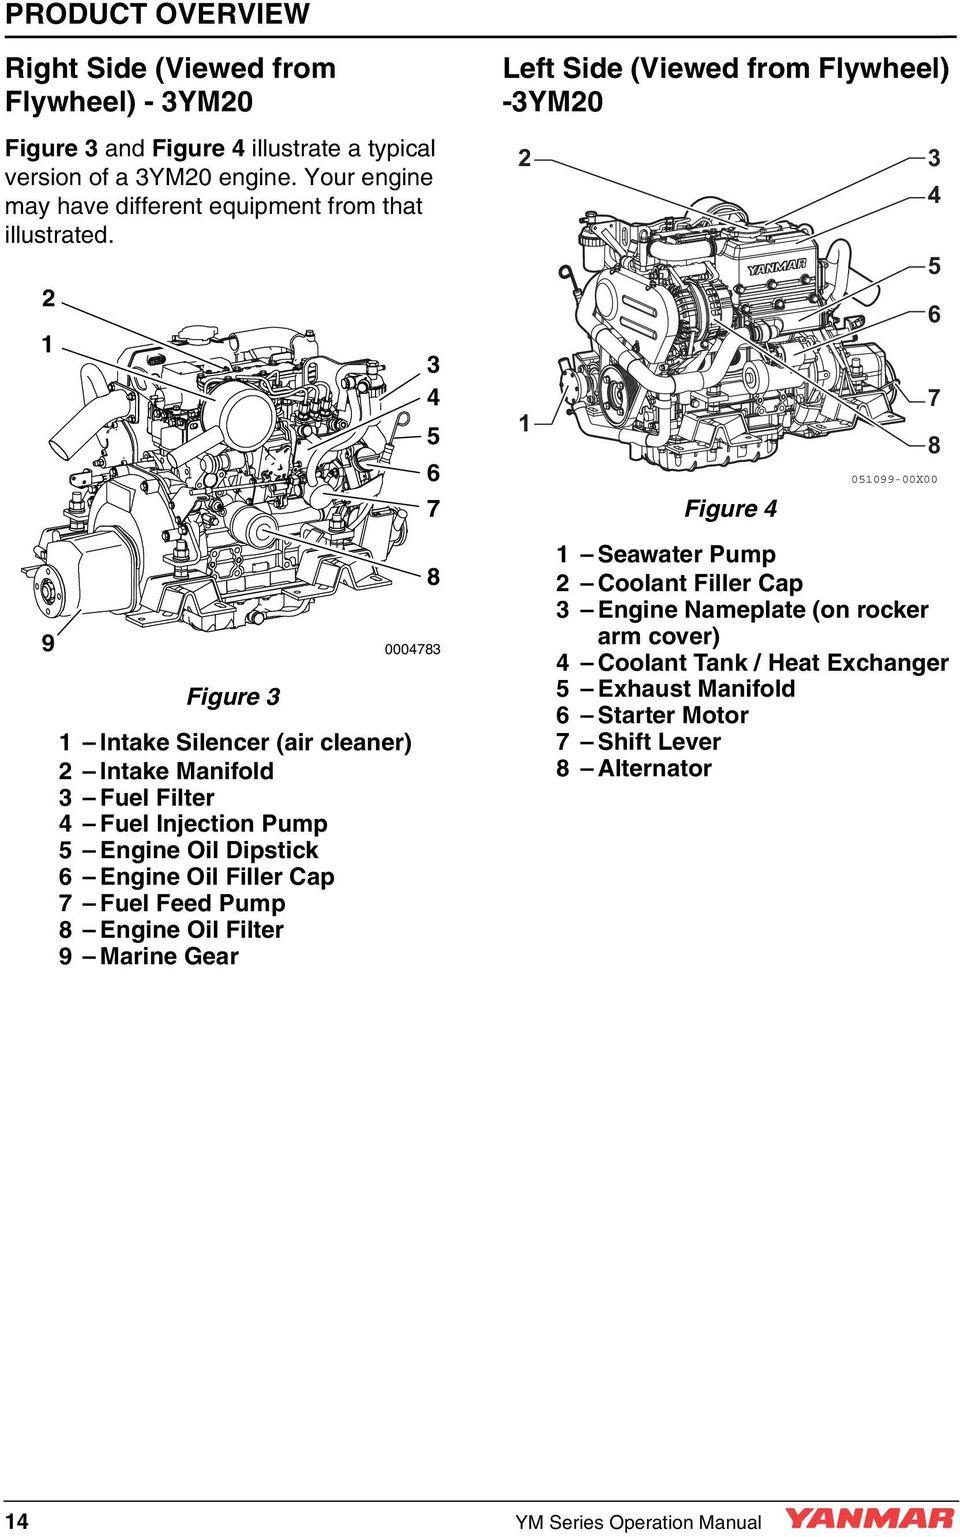 medium resolution of 2 1 figure 3 1 intake silencer air cleaner 2 intake manifold 3 fuel